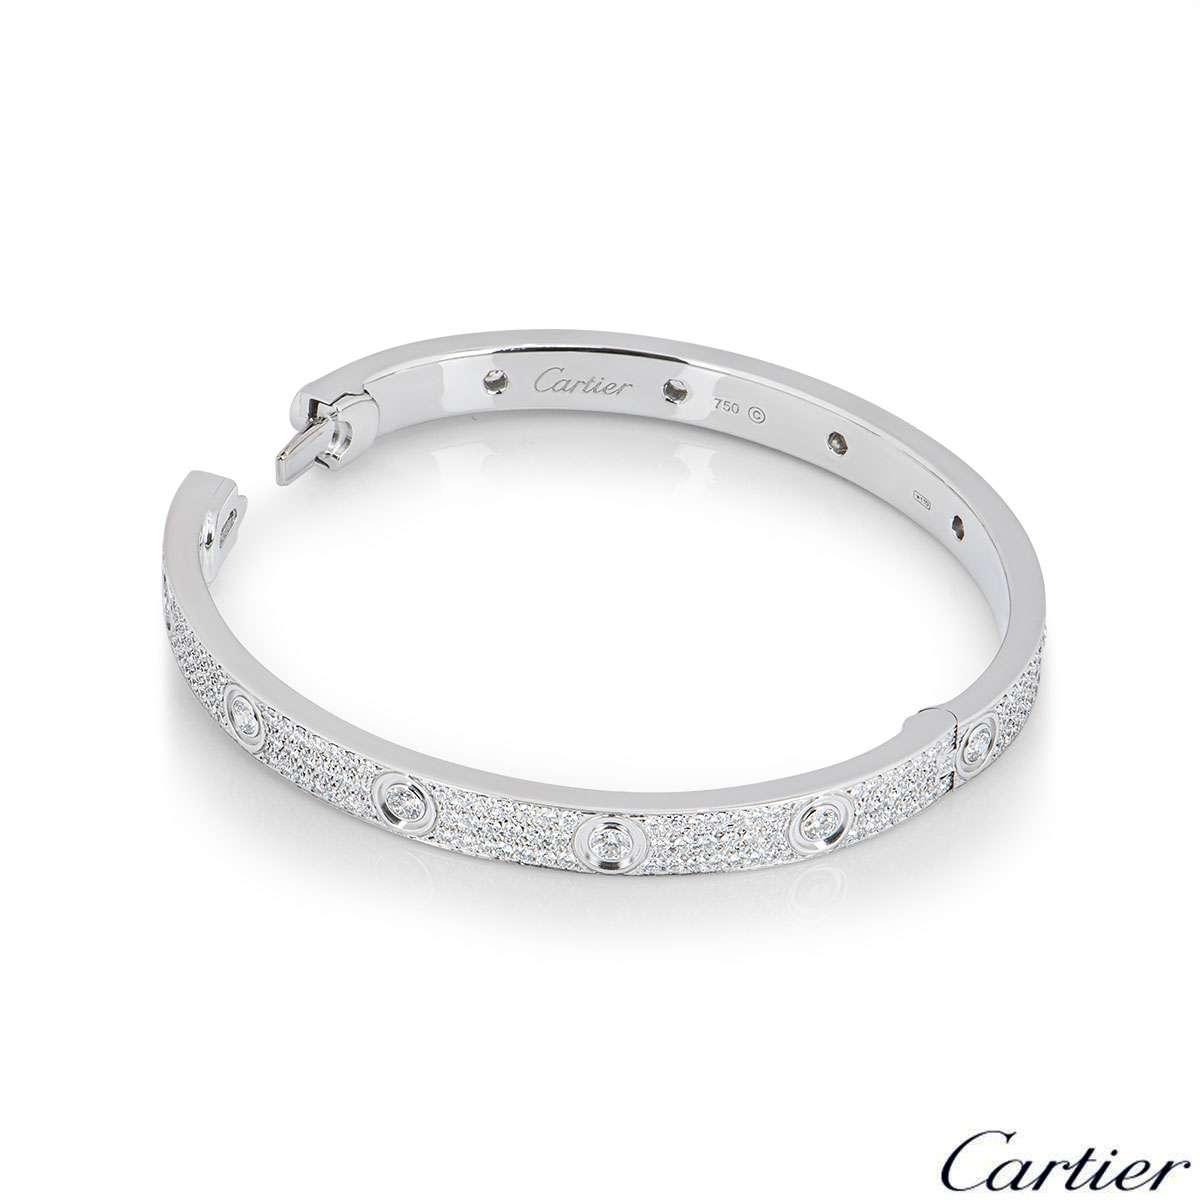 Cartier White Gold Pave Diamond Love Bracelet Size 17 N6033602